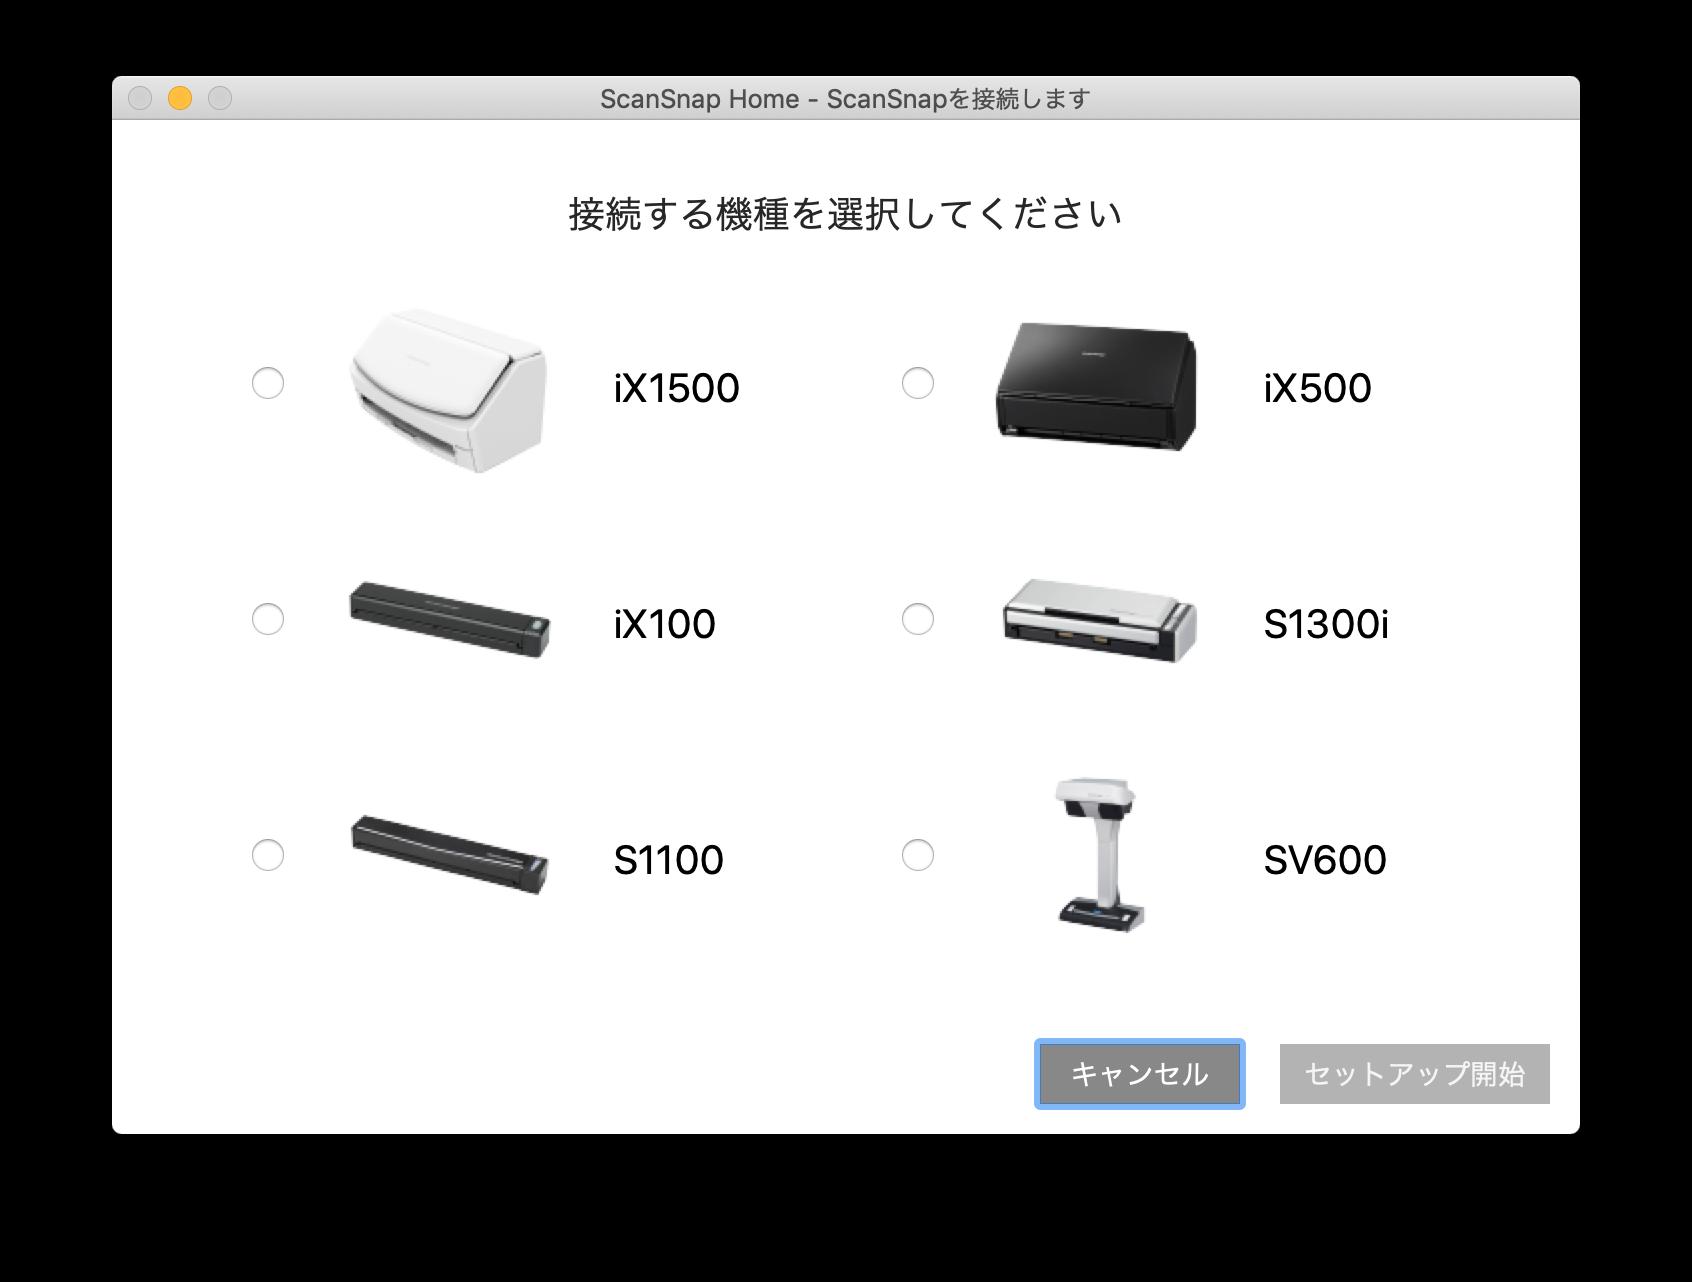 ScanSnap iX1500-22